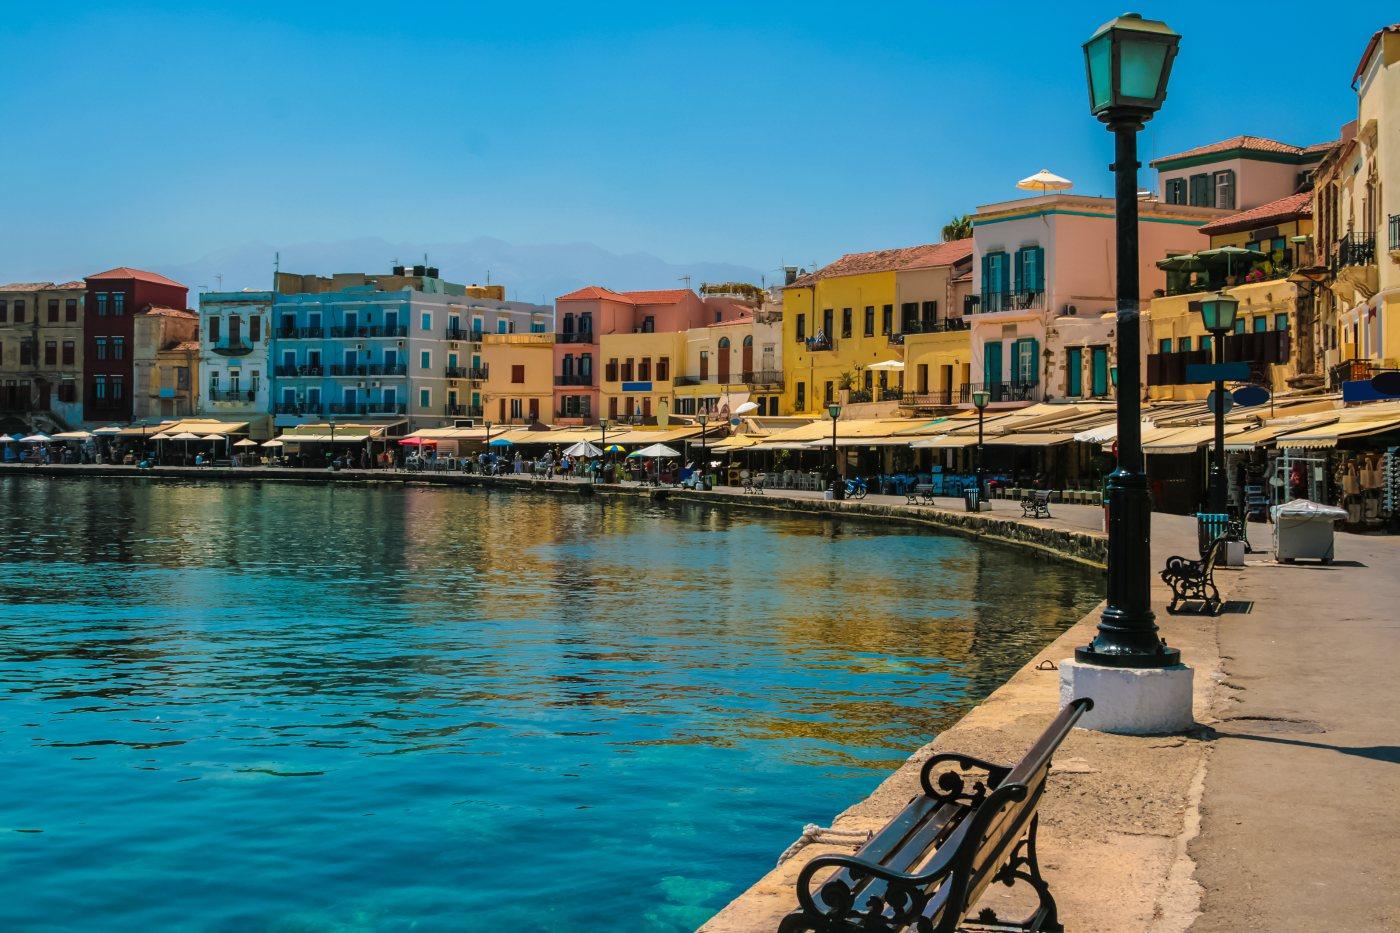 Kreta Beautiful cityscape and promenade in city of Chania on island of Crete, Greece